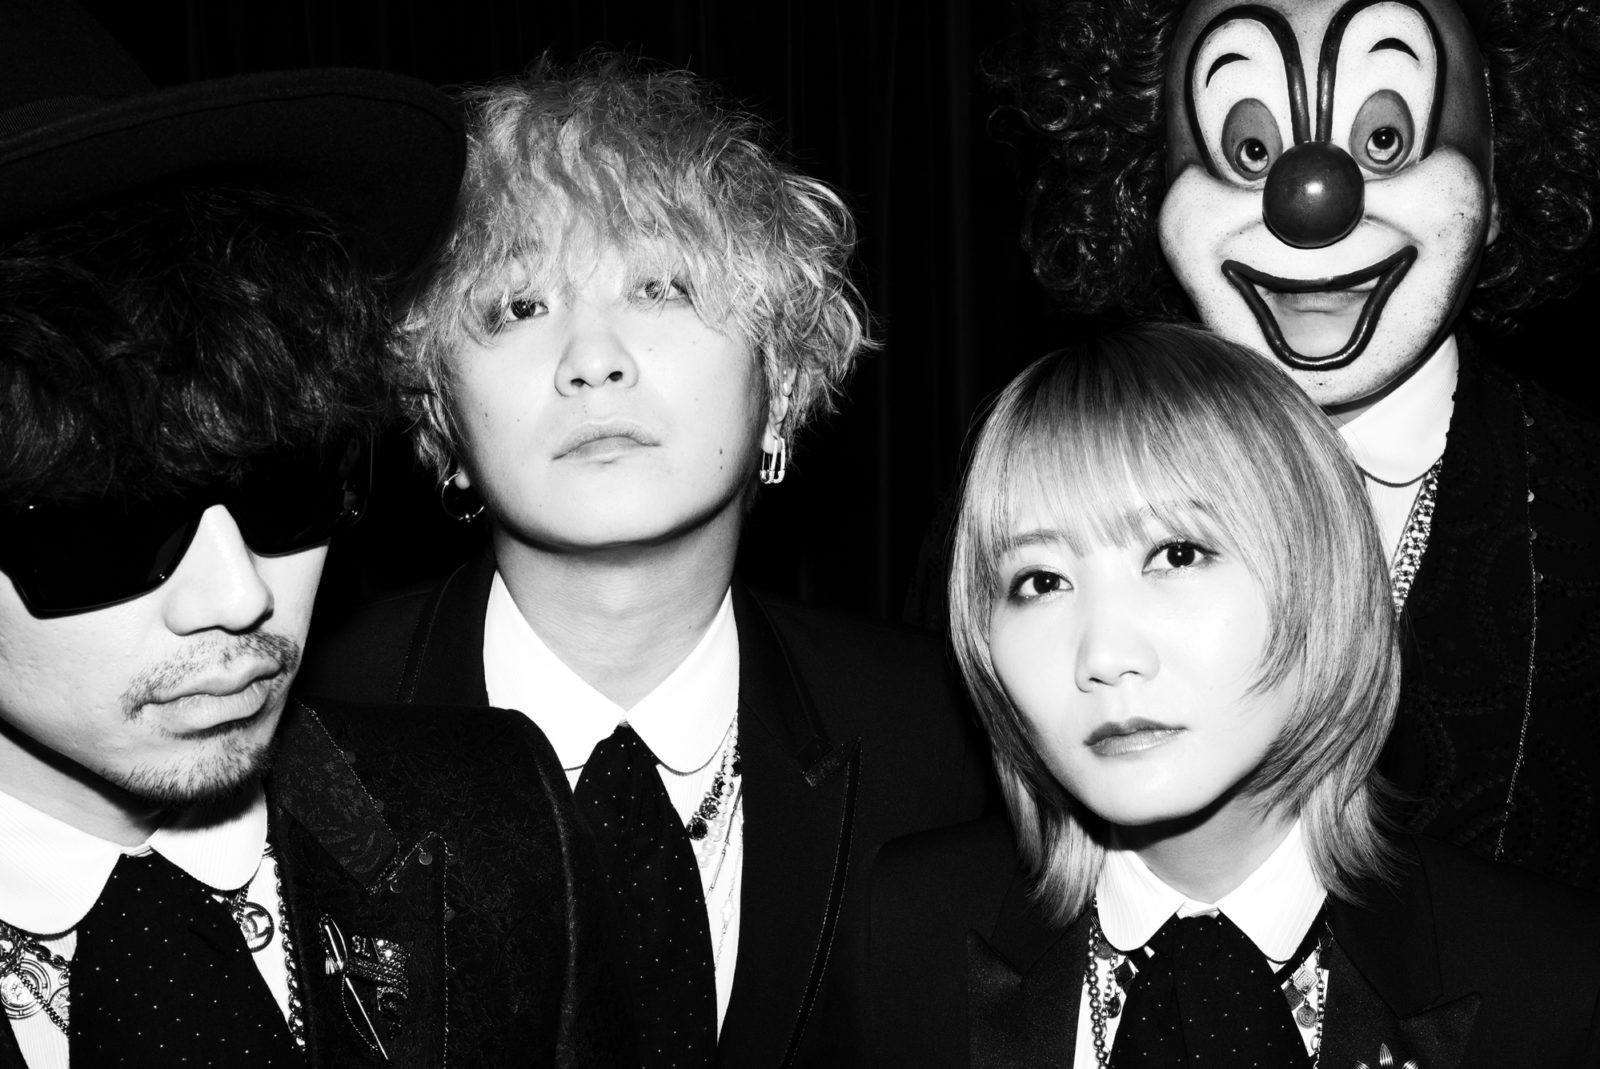 SEKAI NO OWARI、ニューシングル「umbrella」iTunesソングチャートにて1位獲得サムネイル画像